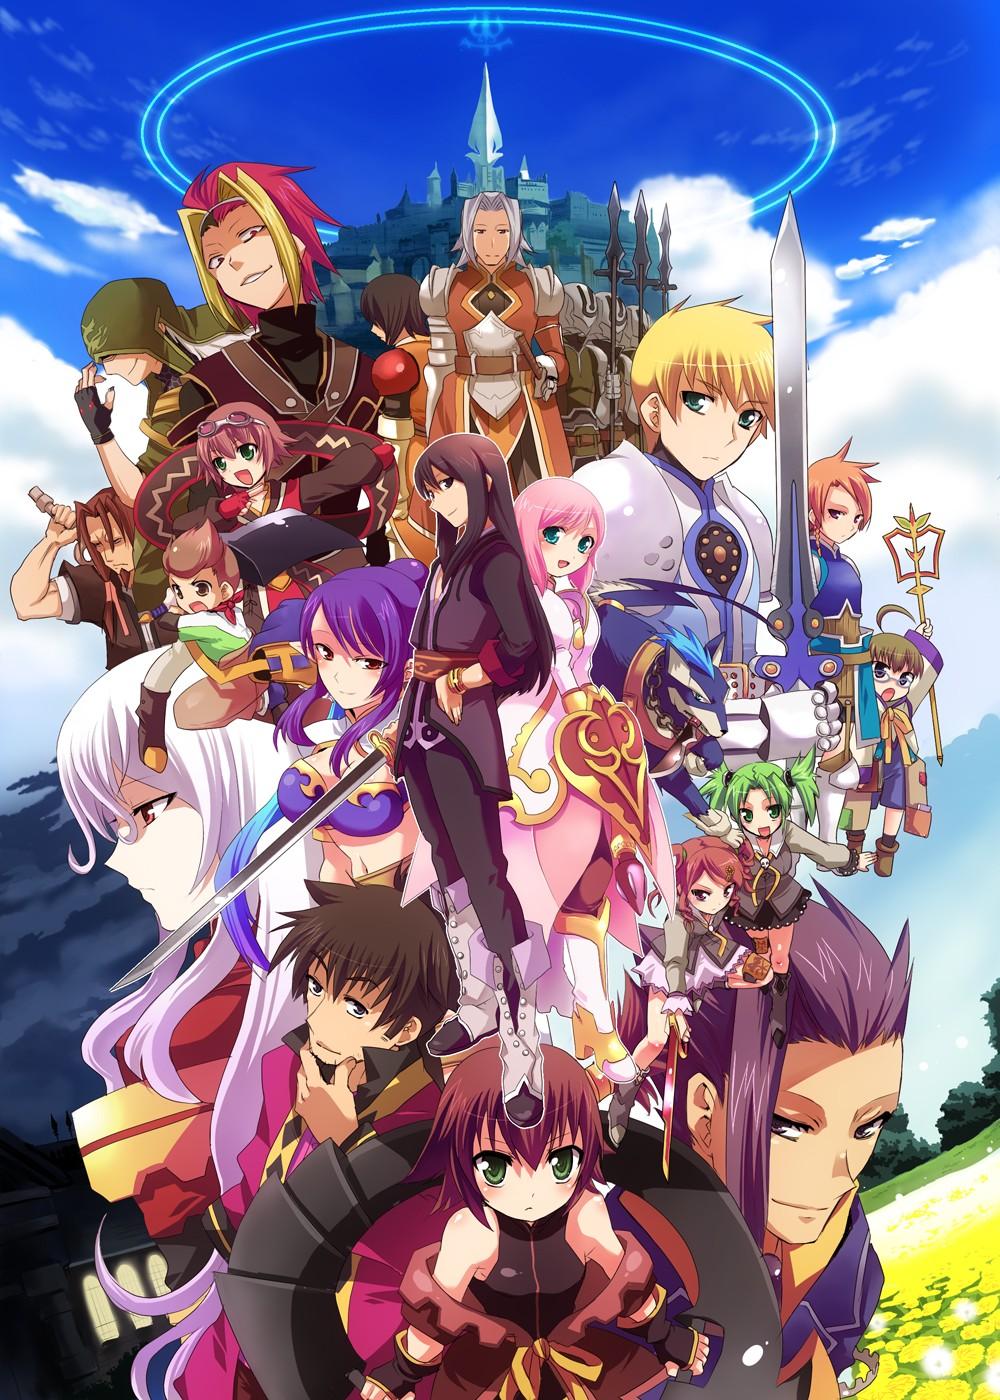 Tales Of Vesperia wallpapers, Anime, HQ Tales Of Vesperia ...